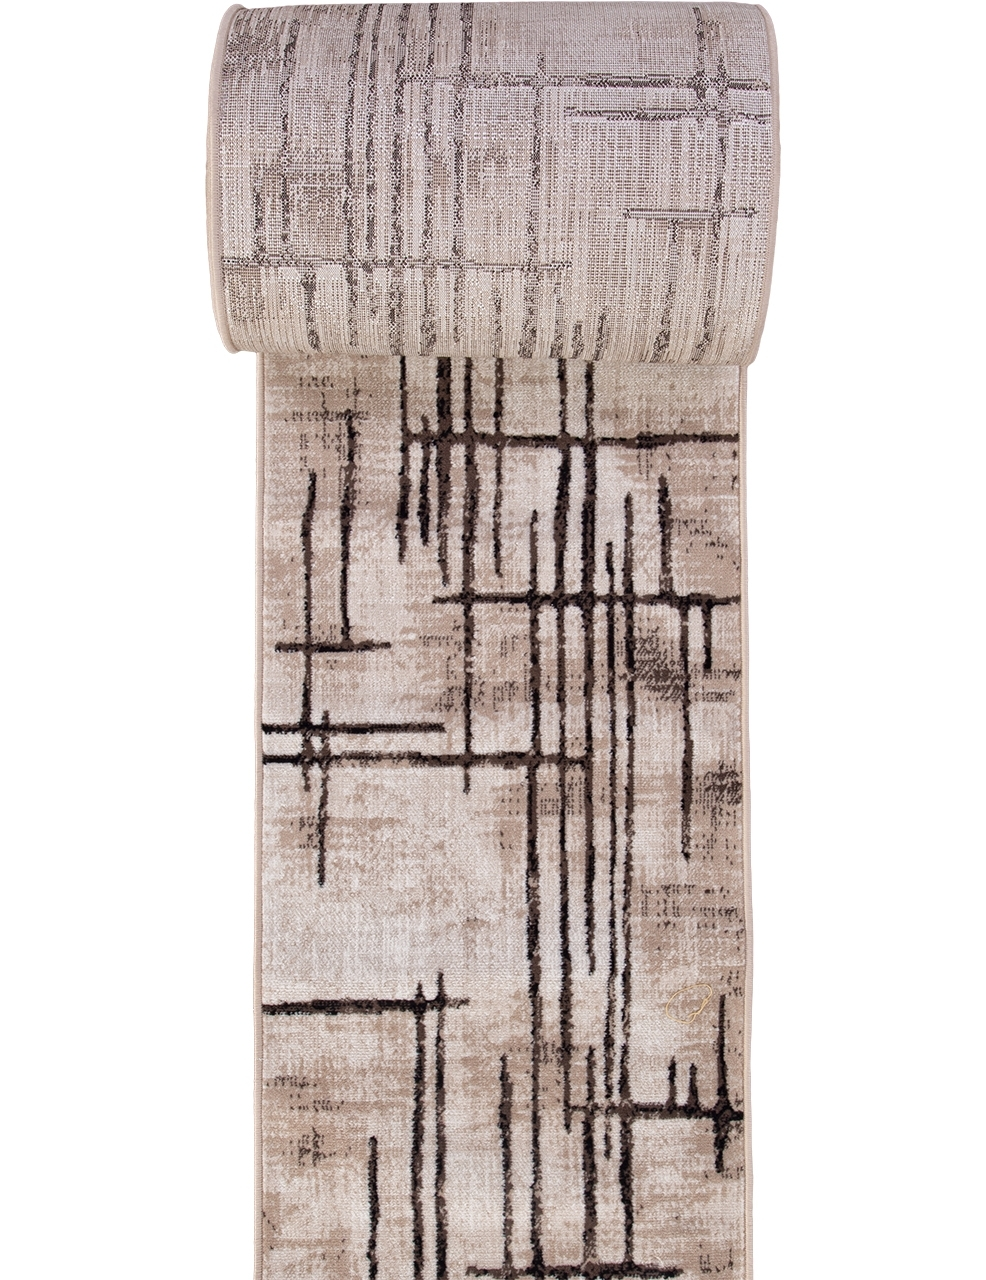 Ковровая дорожка D717 - BEIGE-BROWN - коллекция SIERRA - фото 2